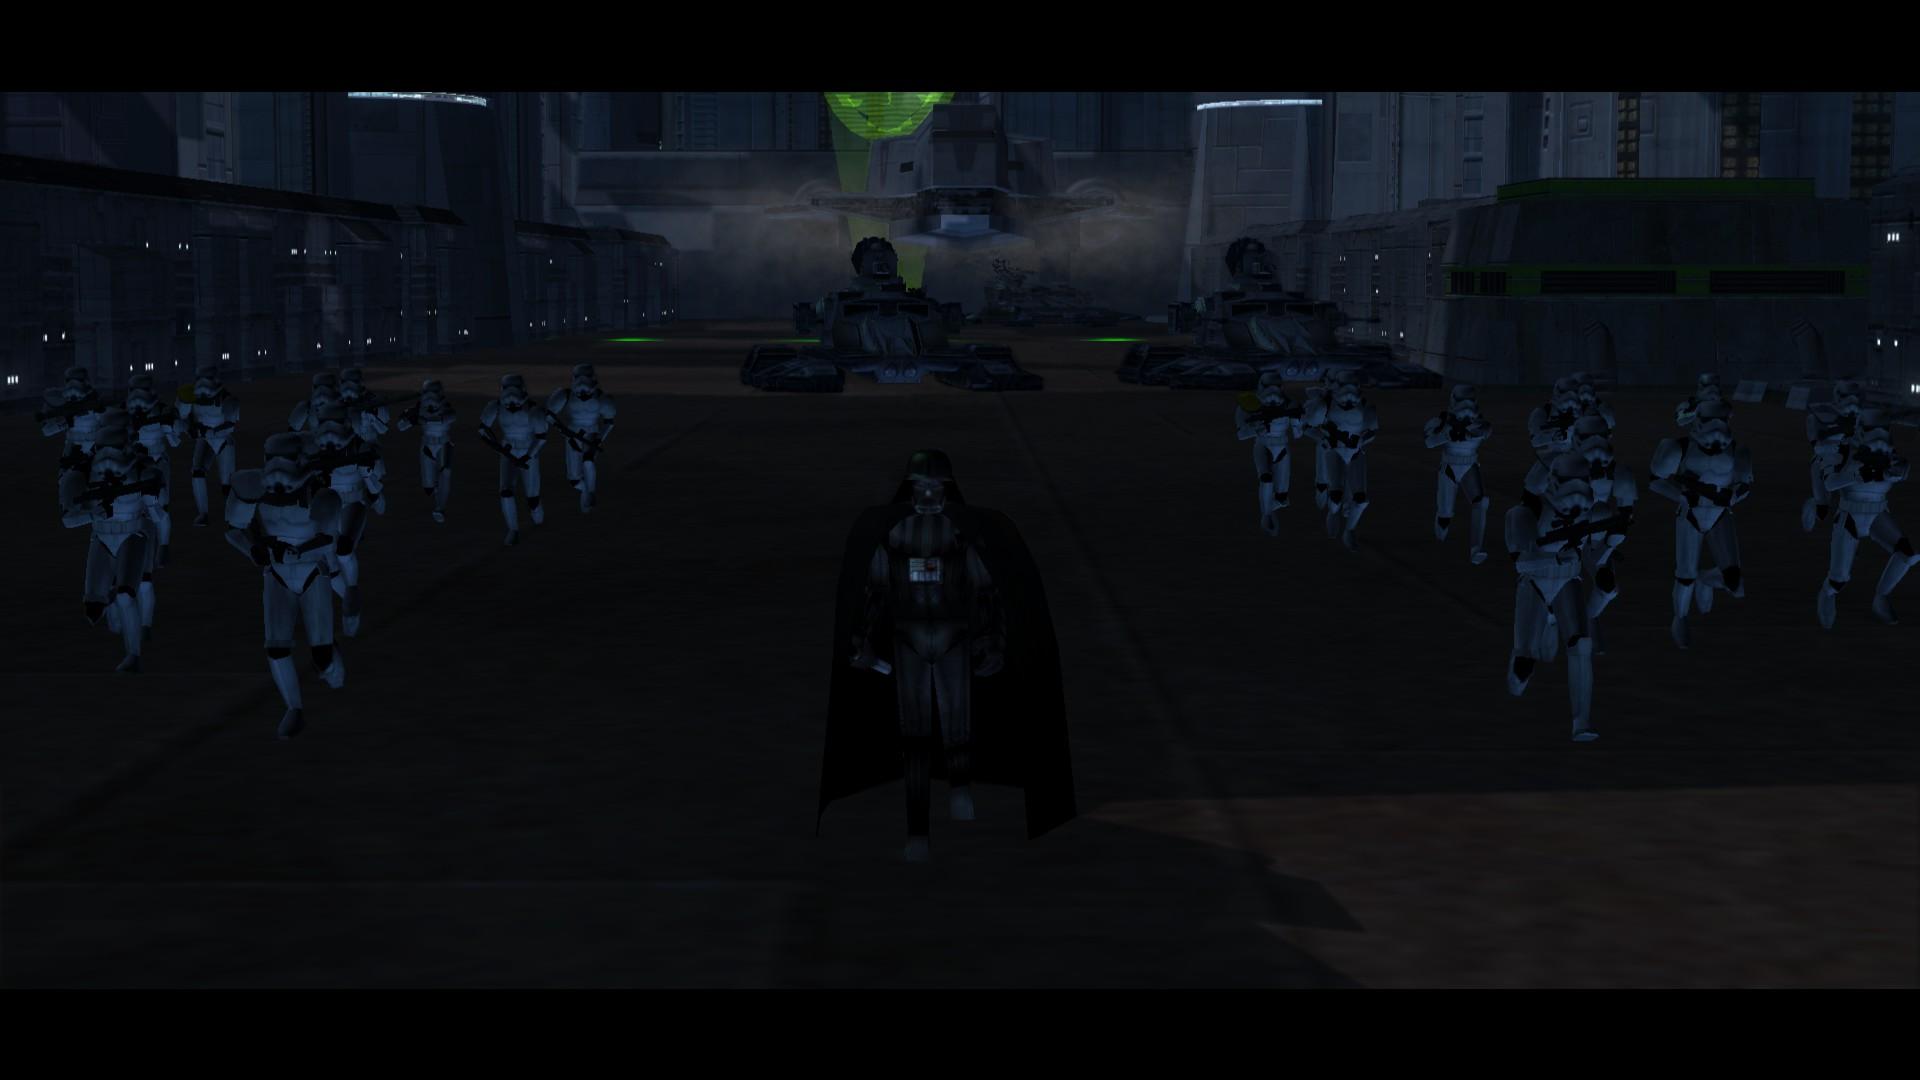 Awakening of the Rebellion 2 7 mod for Star Wars: Empire at